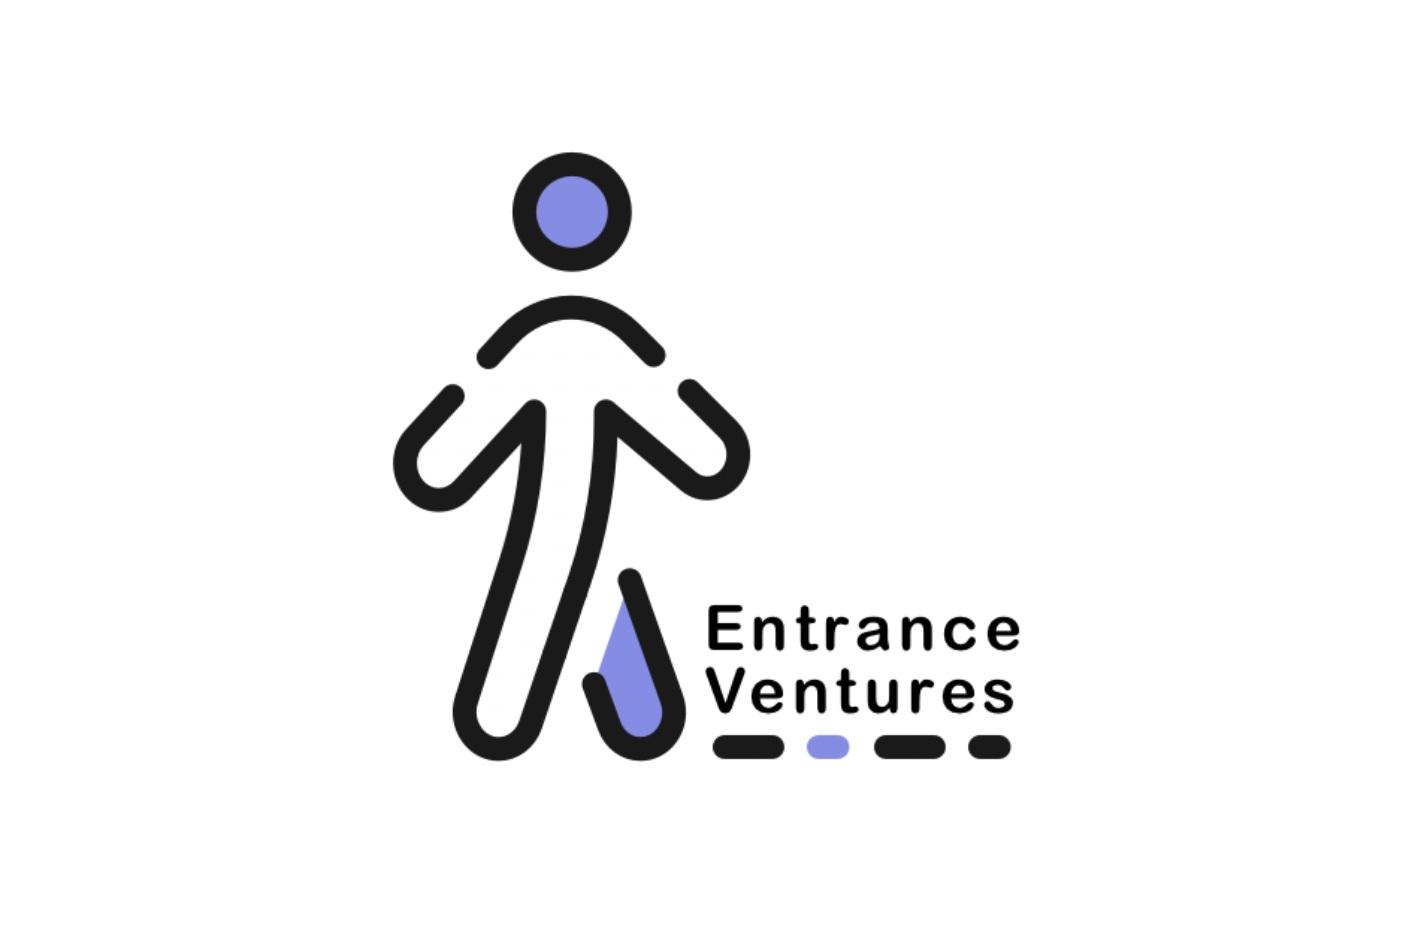 Entrance Ventures